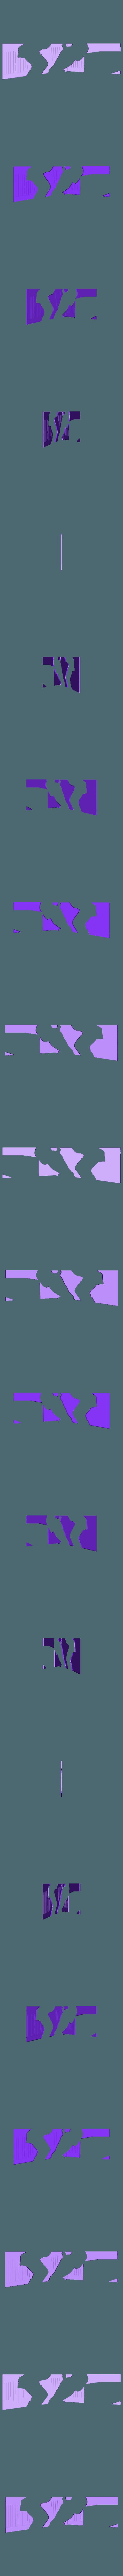 Wainscoting.stl Download free STL file Metaphor • 3D printing template, JayOmega